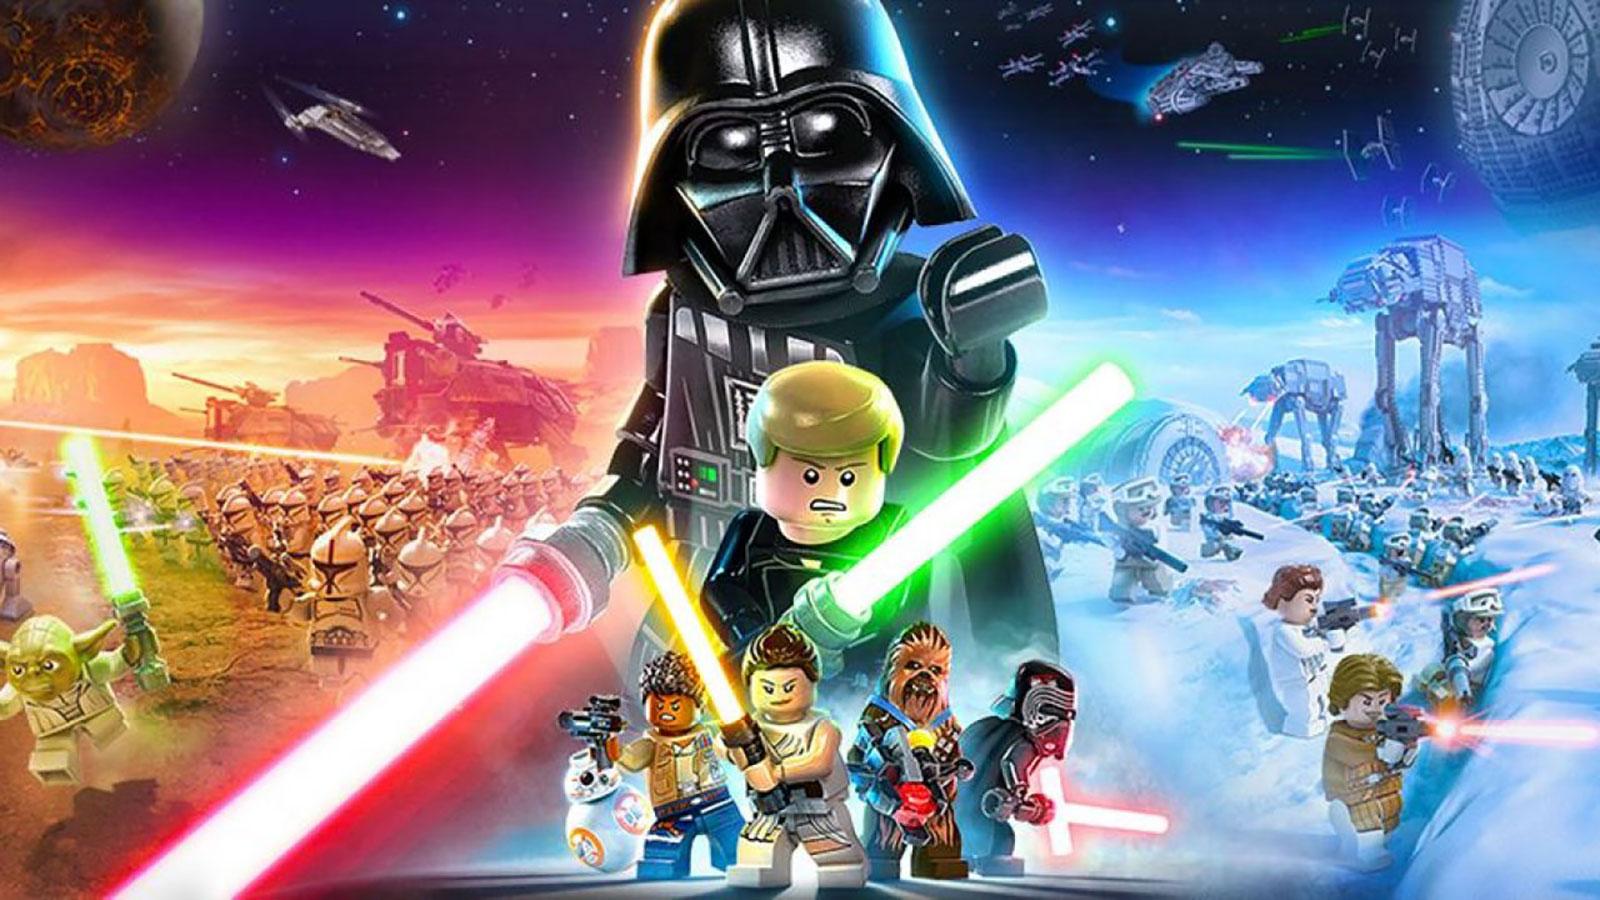 The latest Lego Star Wars game has been postponed indefinitely – Yahoo Finance Australia